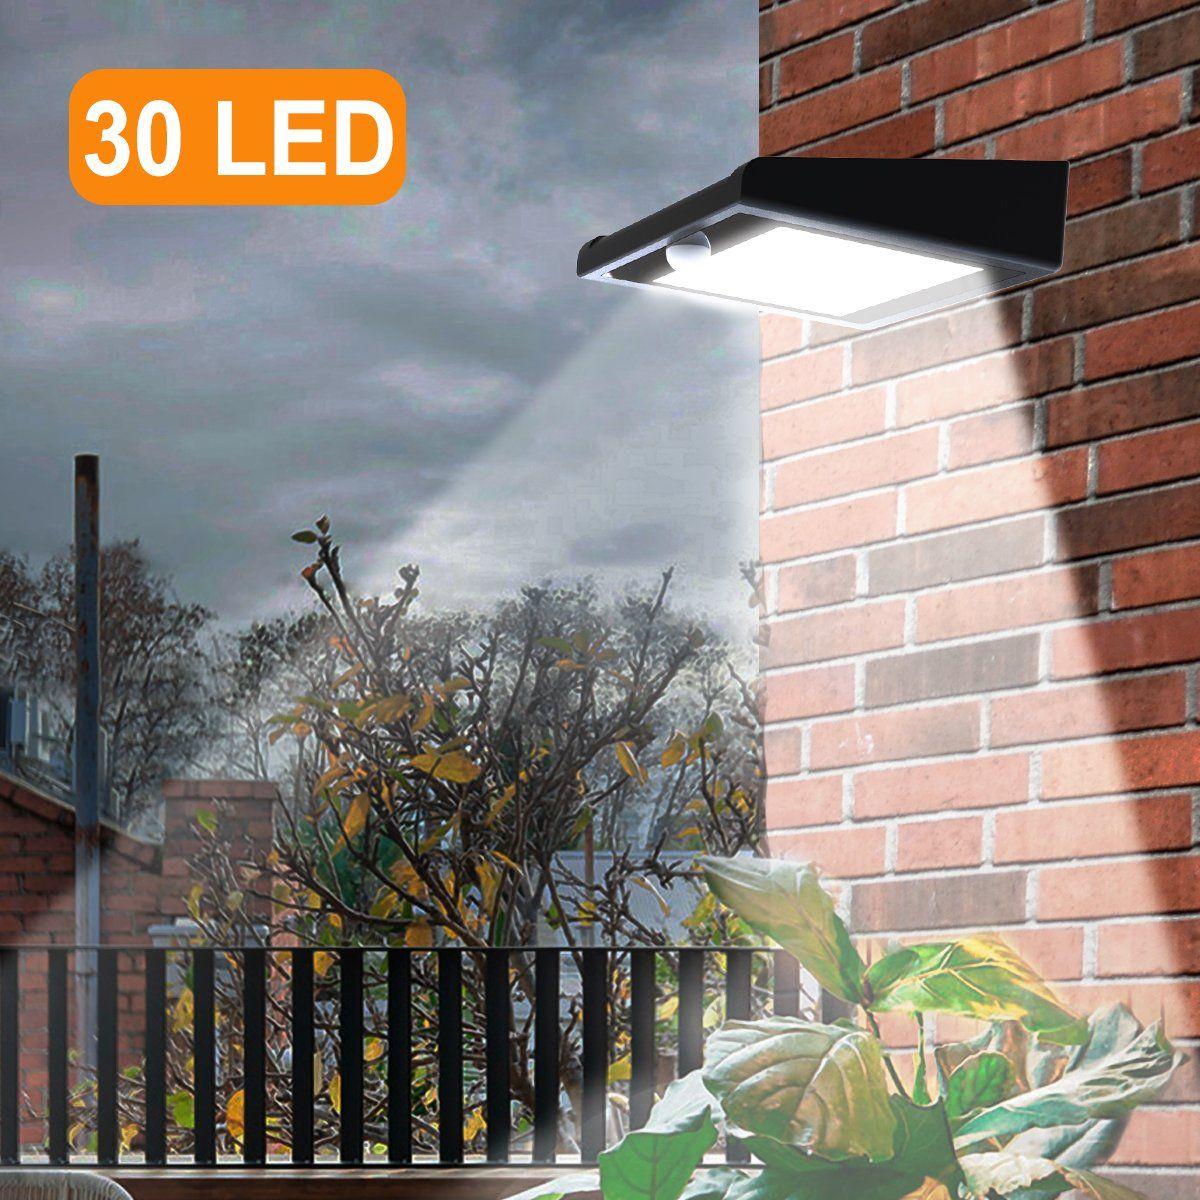 30 Led Solar Lights Outdoor Super Bright Iextreme Solar Motion Sensor Lights Wireless Waterproof Security Lights Solar Patio Lights Solar Lights Solar Patio